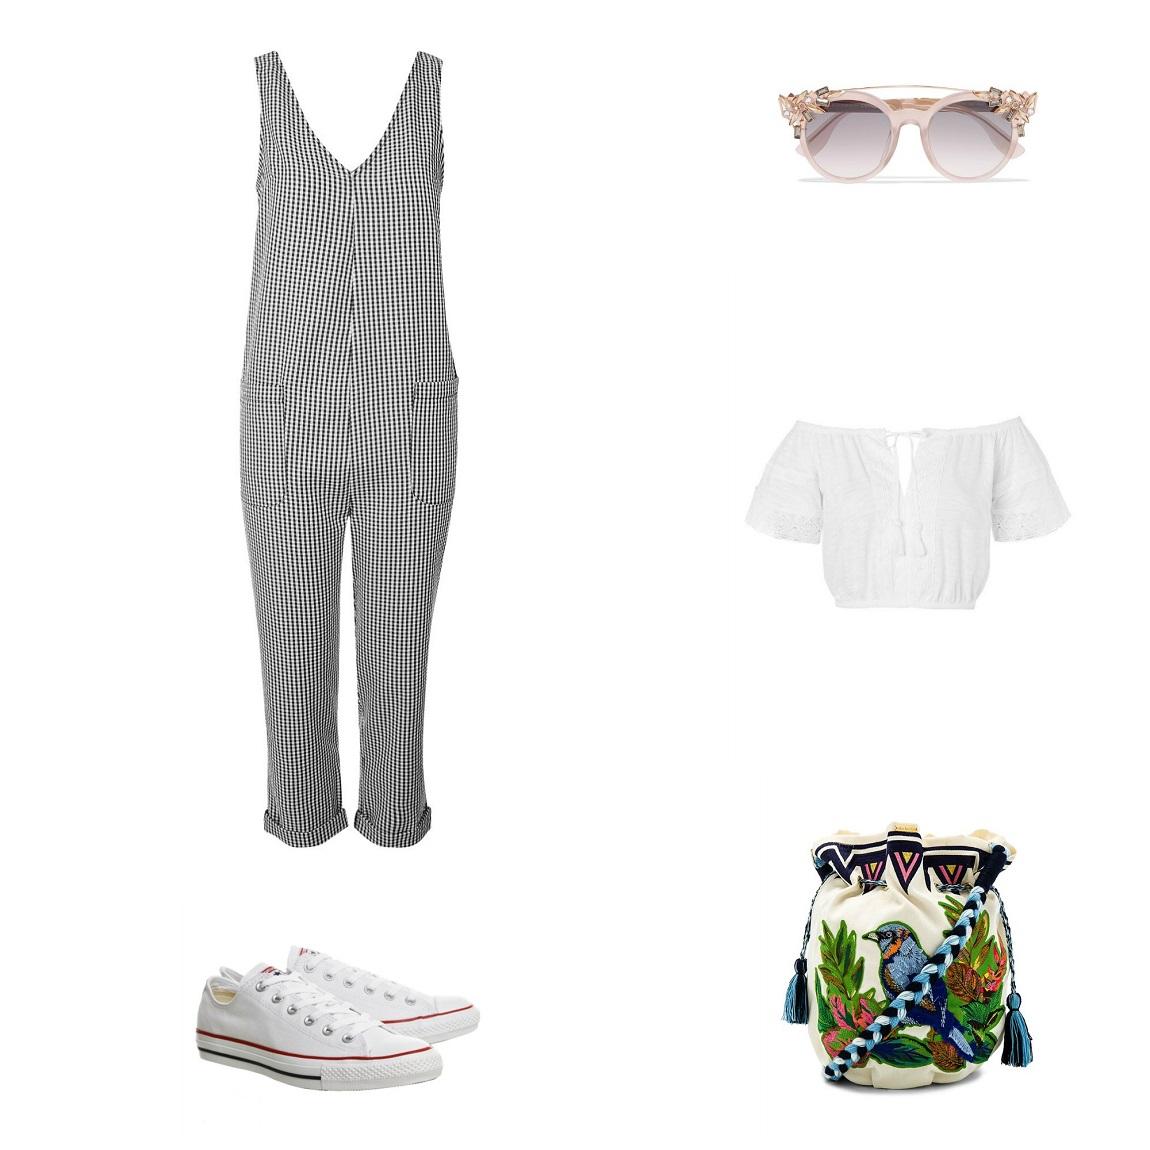 5 Coachella Outfits Festival Fashion for Women - Christobel Travel